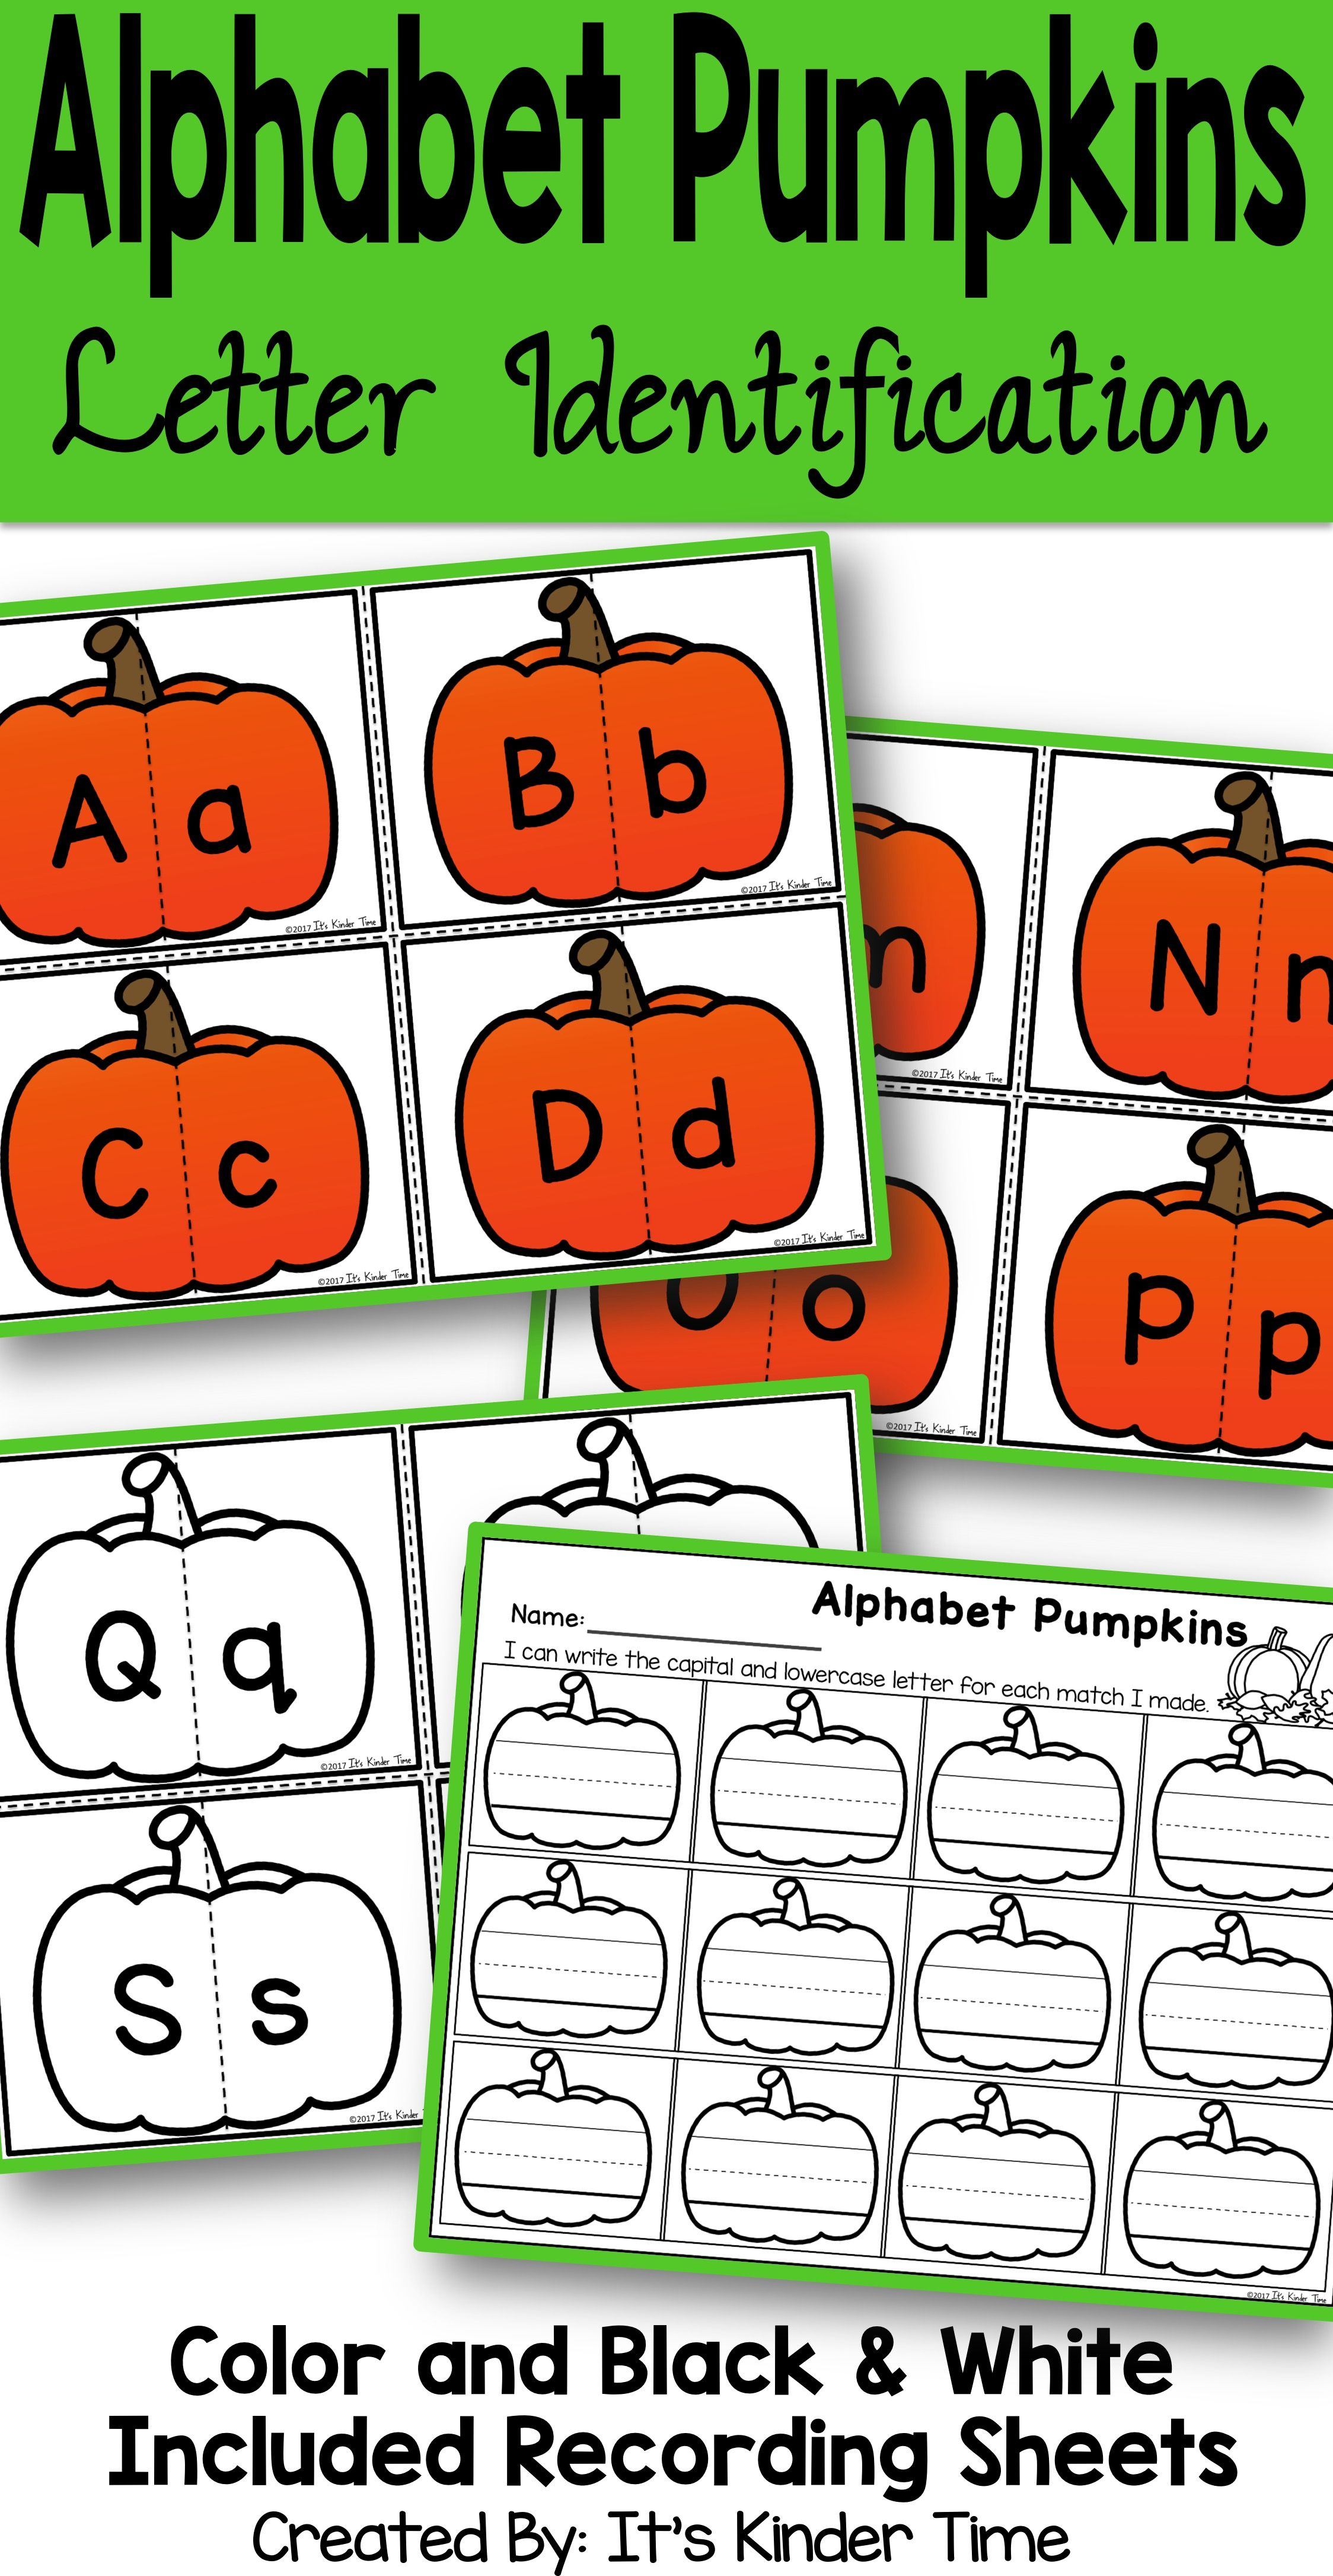 Alphabet Pumpkins